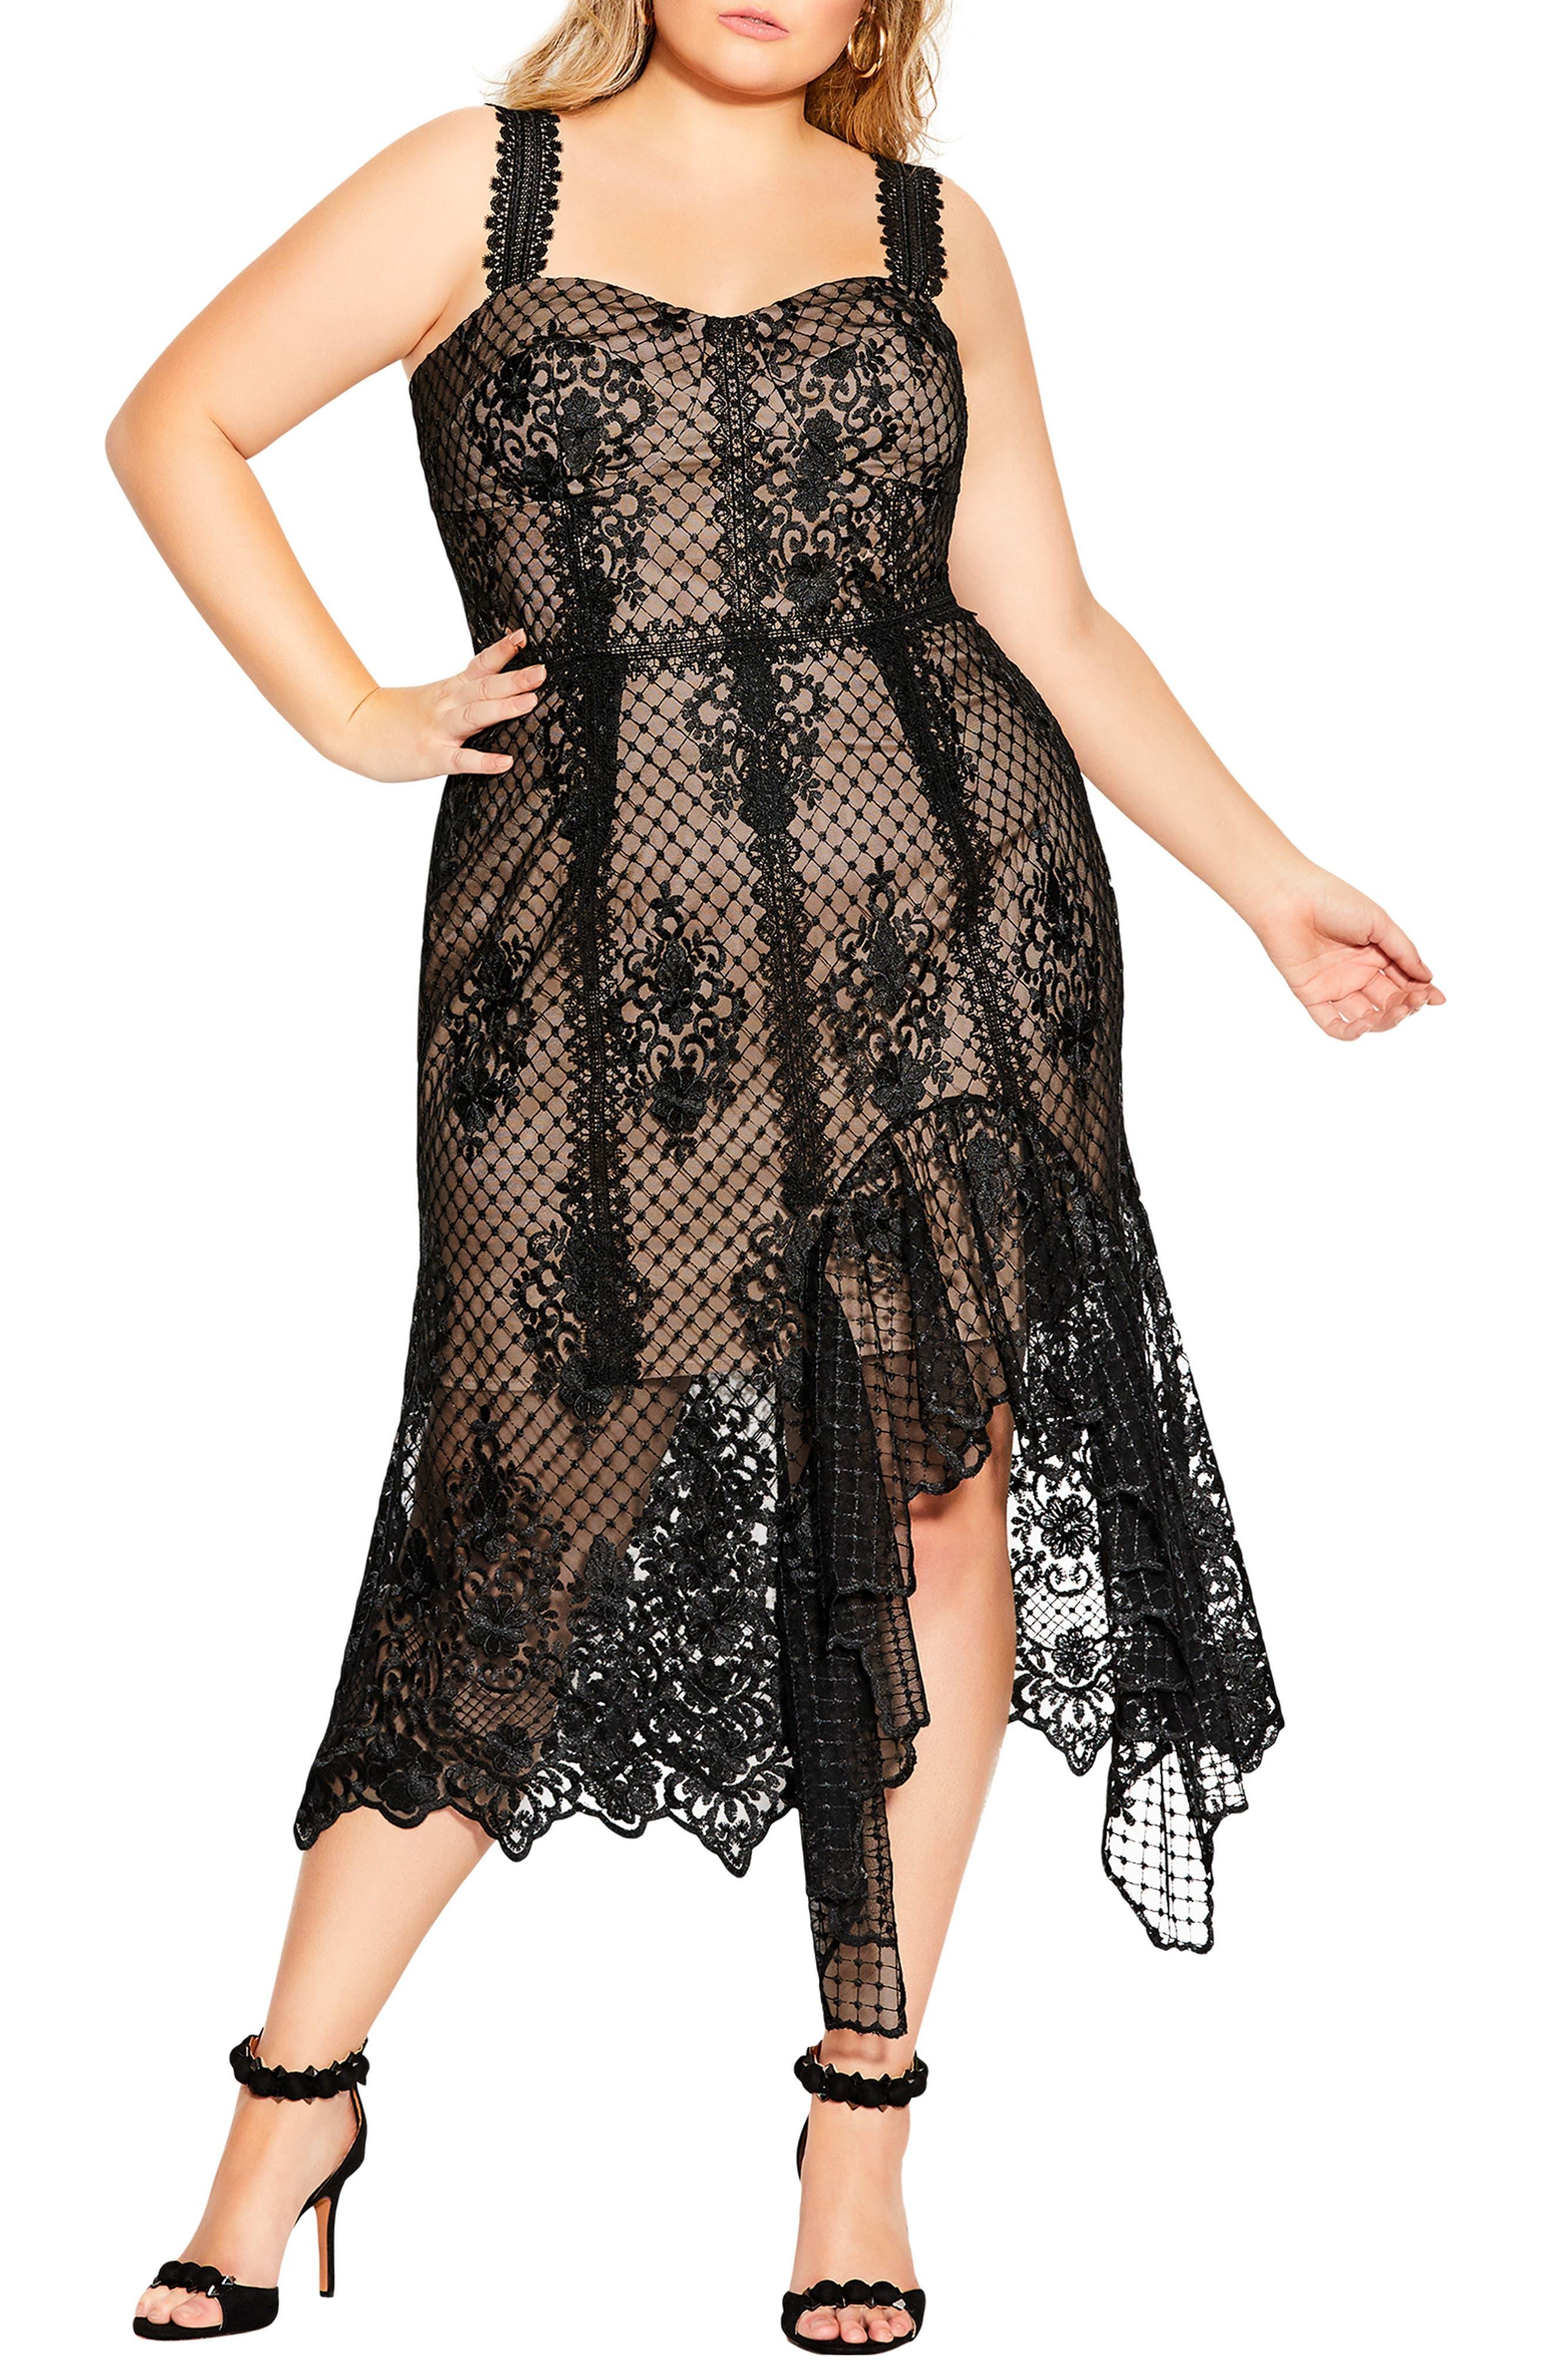 Glamorous Illusion Lace Mermaid Midi Dress